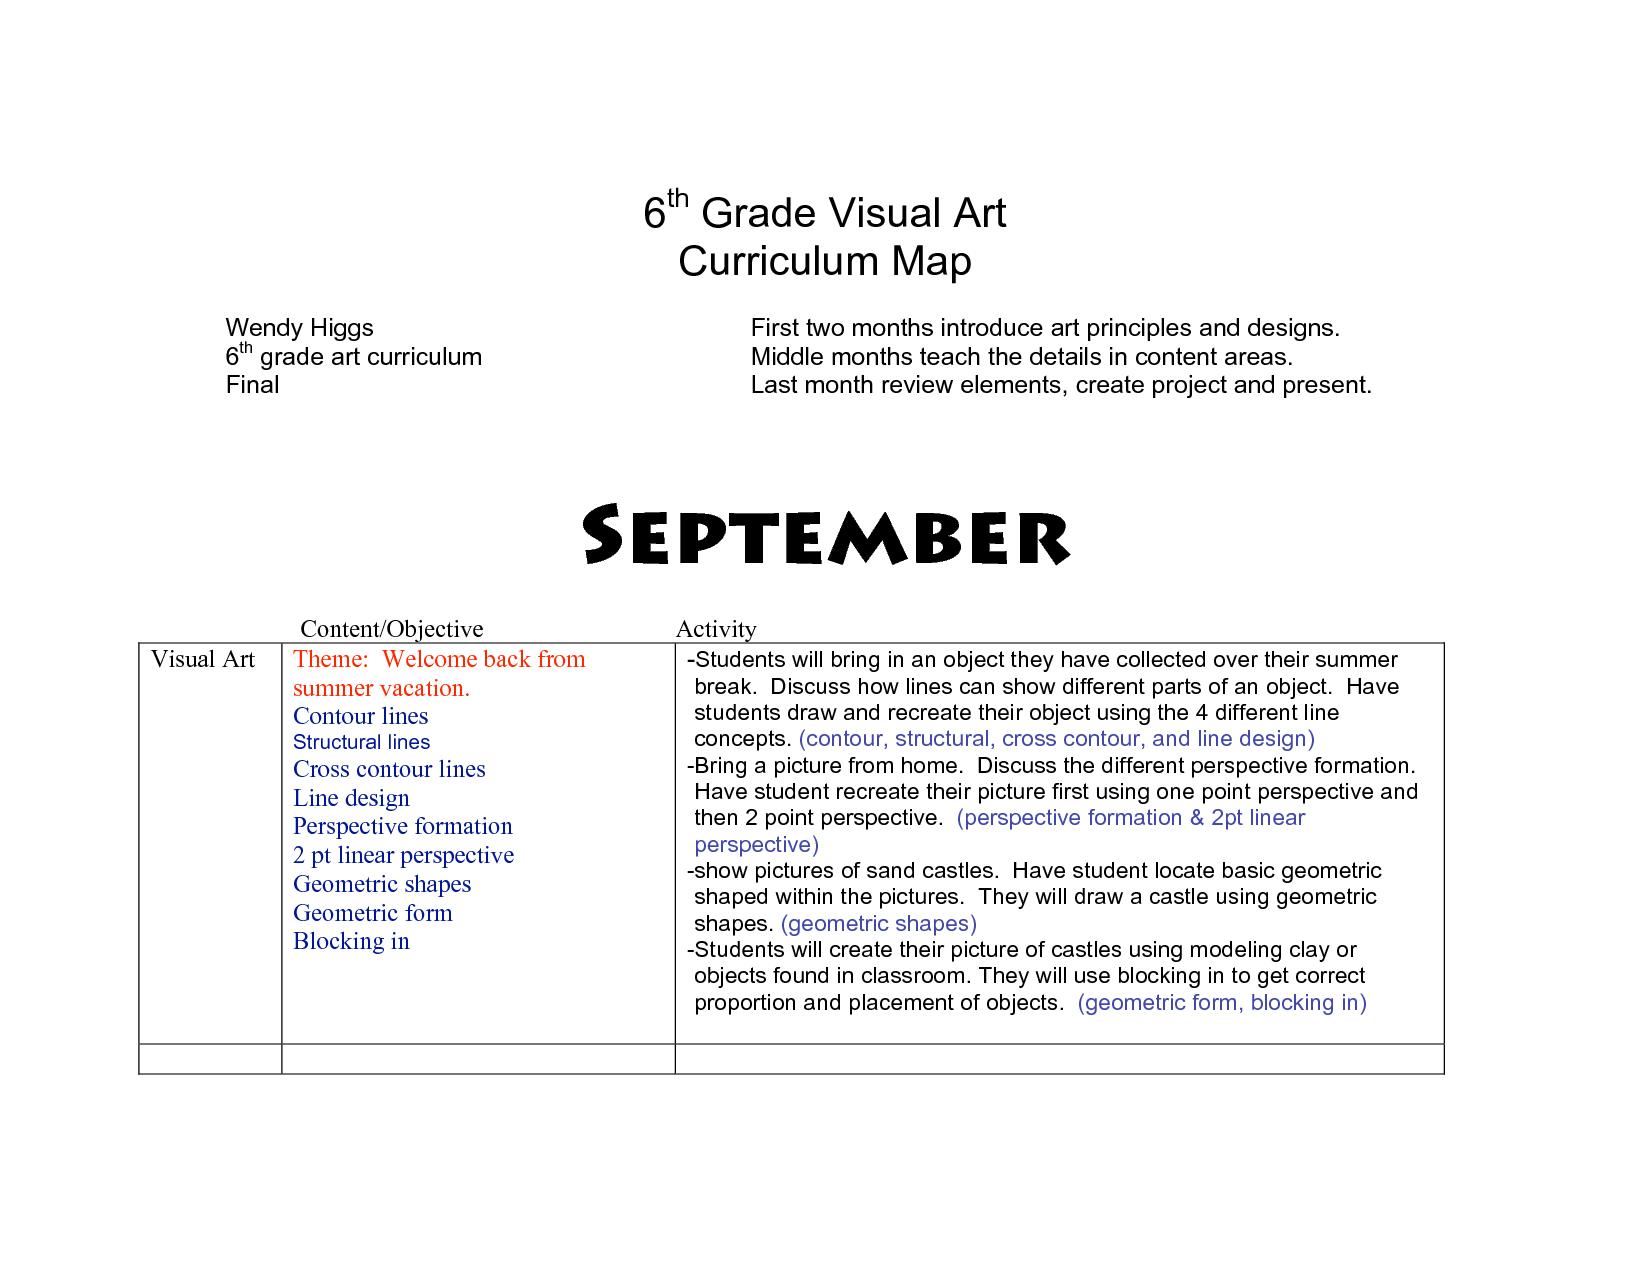 6th Grade Visual Art Curriculum Map